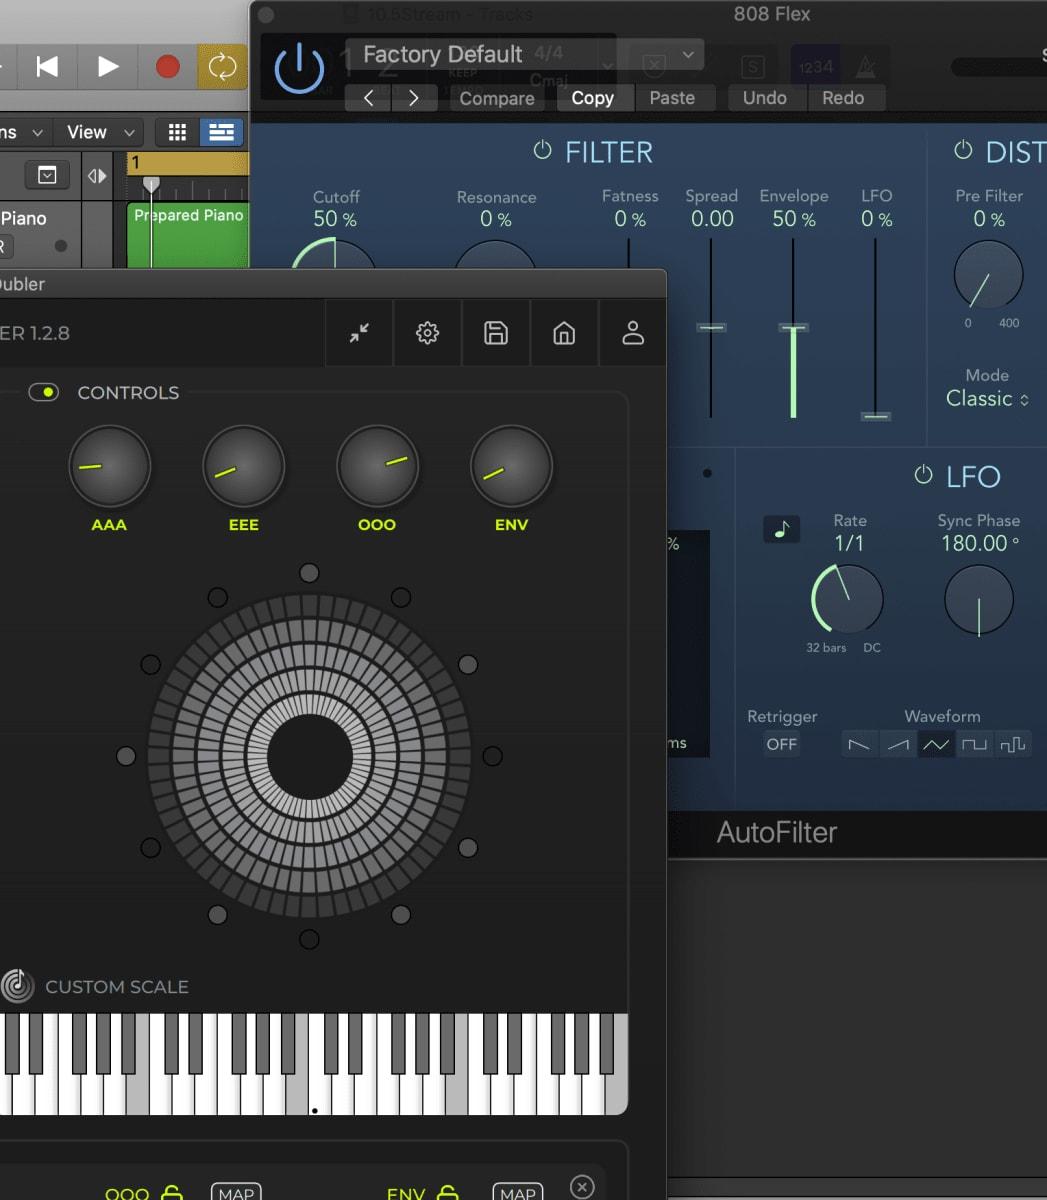 MIDI Mapping In Logic Pro X